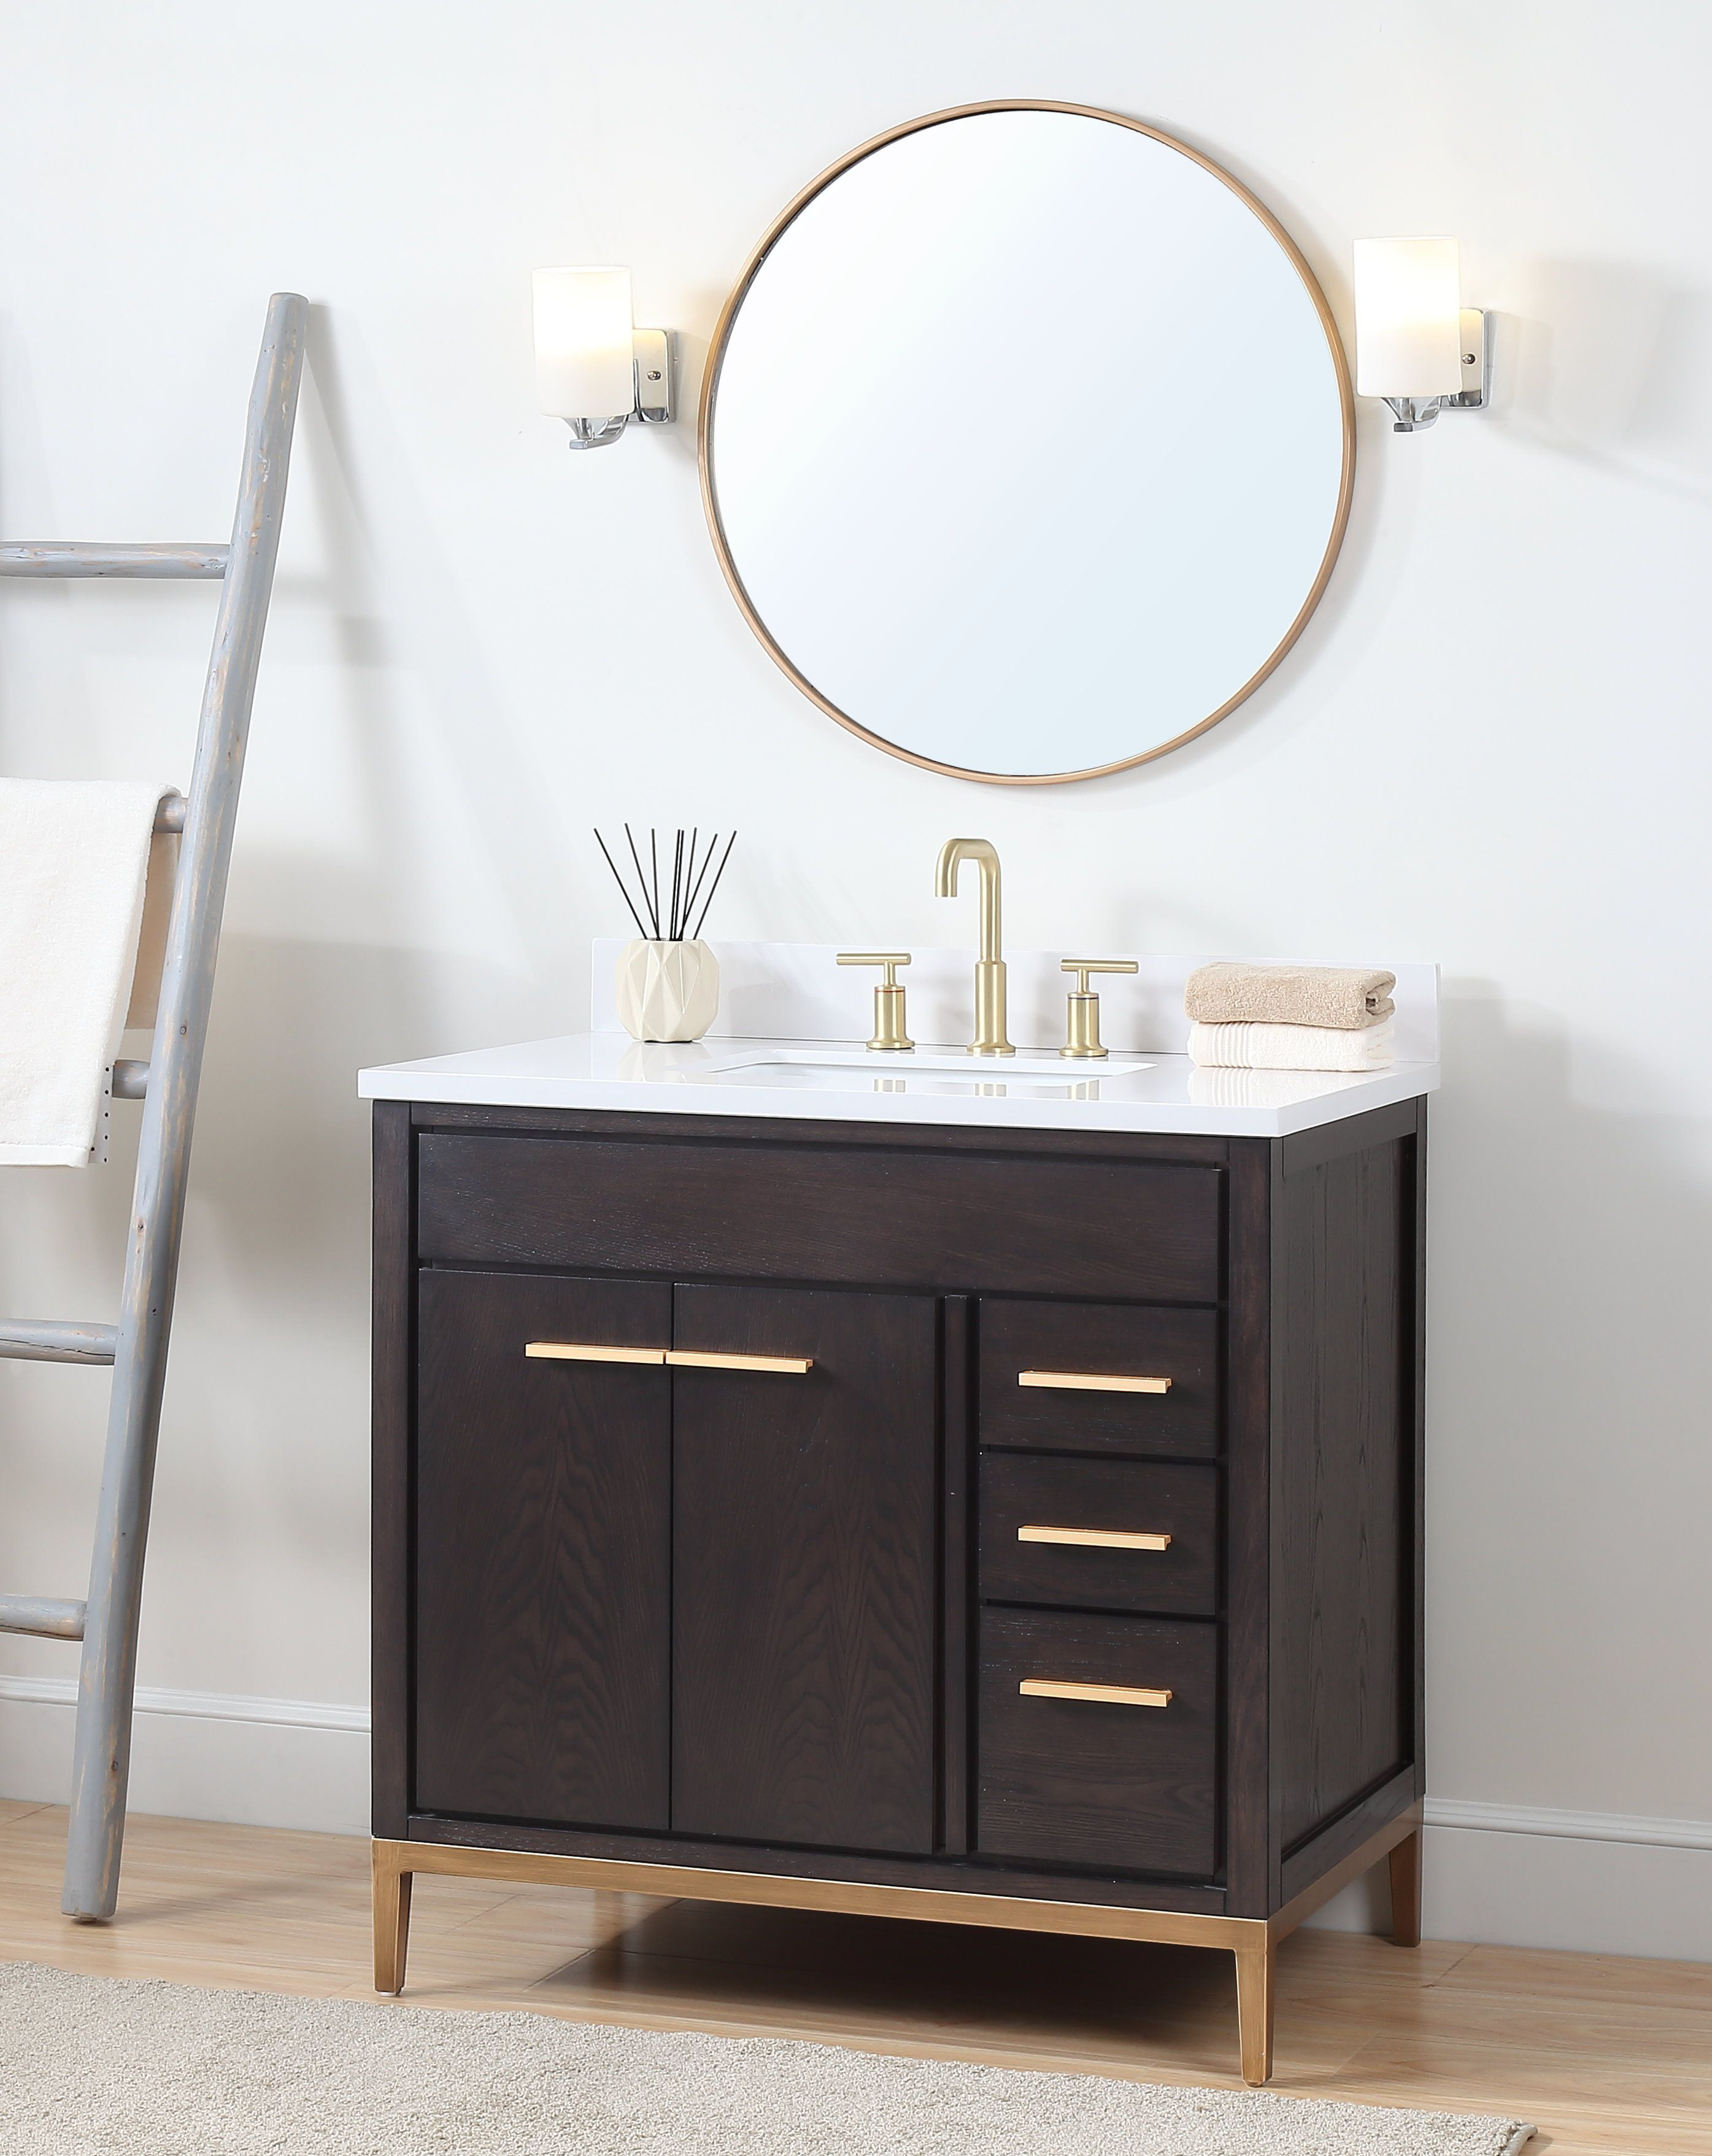 36 Tennant Brand Modern Style Beatrice Bathroom Sink Vanity Tb 9838dk V36 Wenge Small Bathroom Makeover Modern Style Bathroom Bathroom Vanities Without Tops